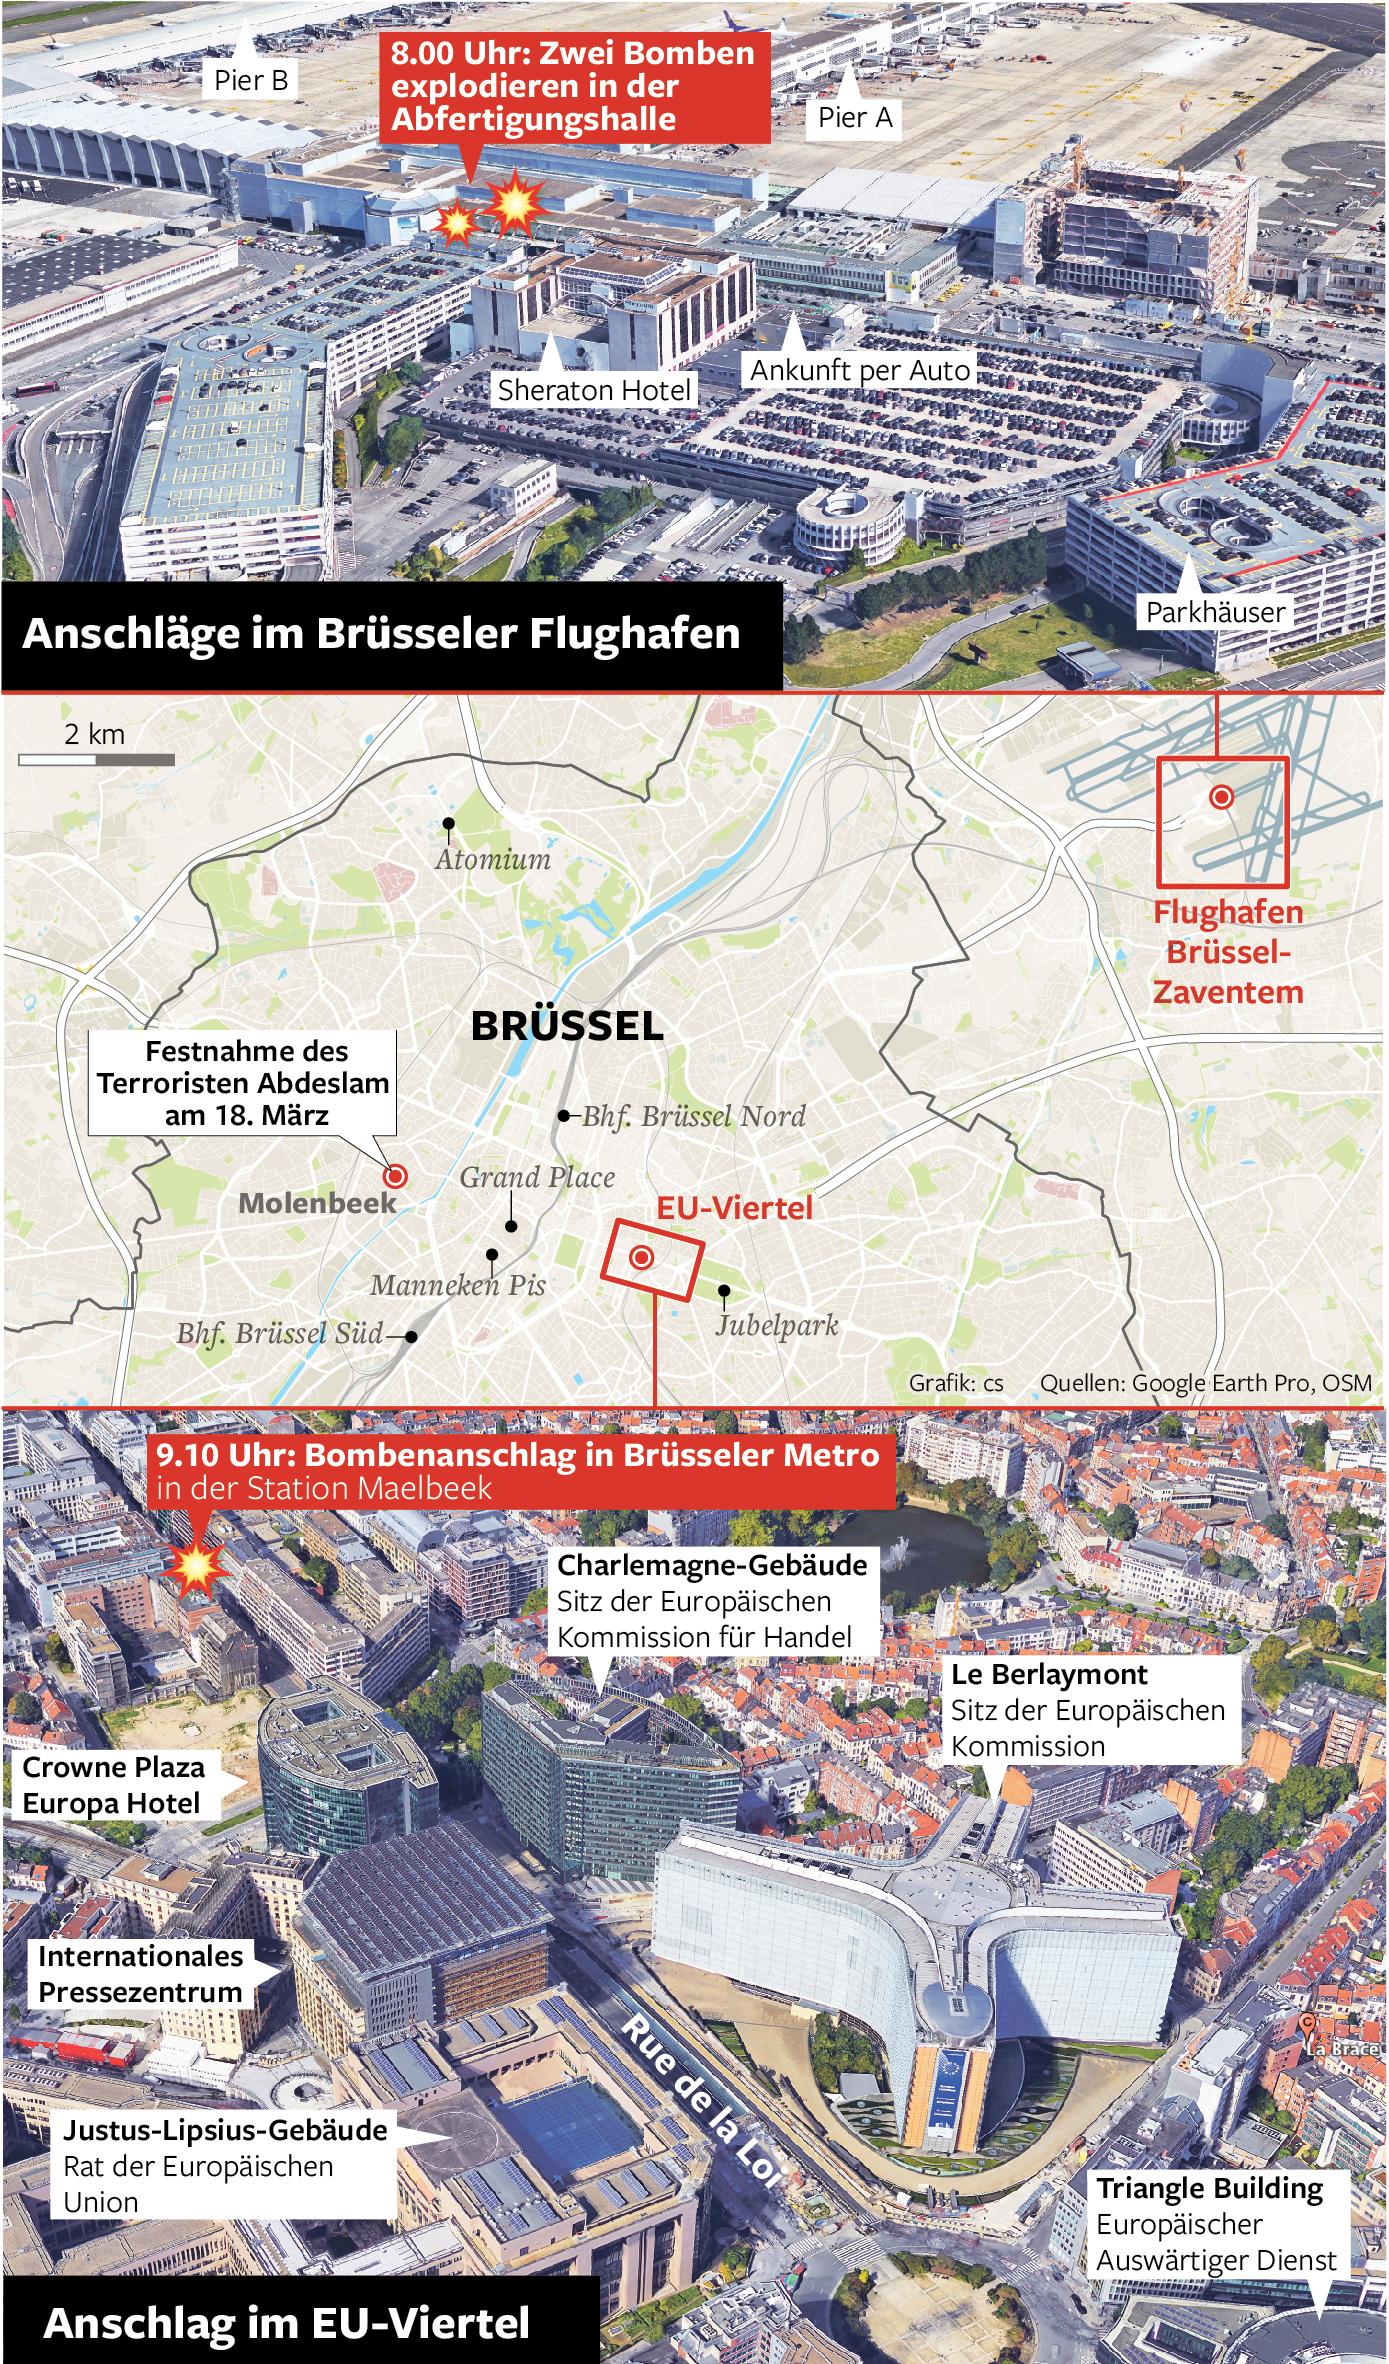 Anschlagsorte Brüssel